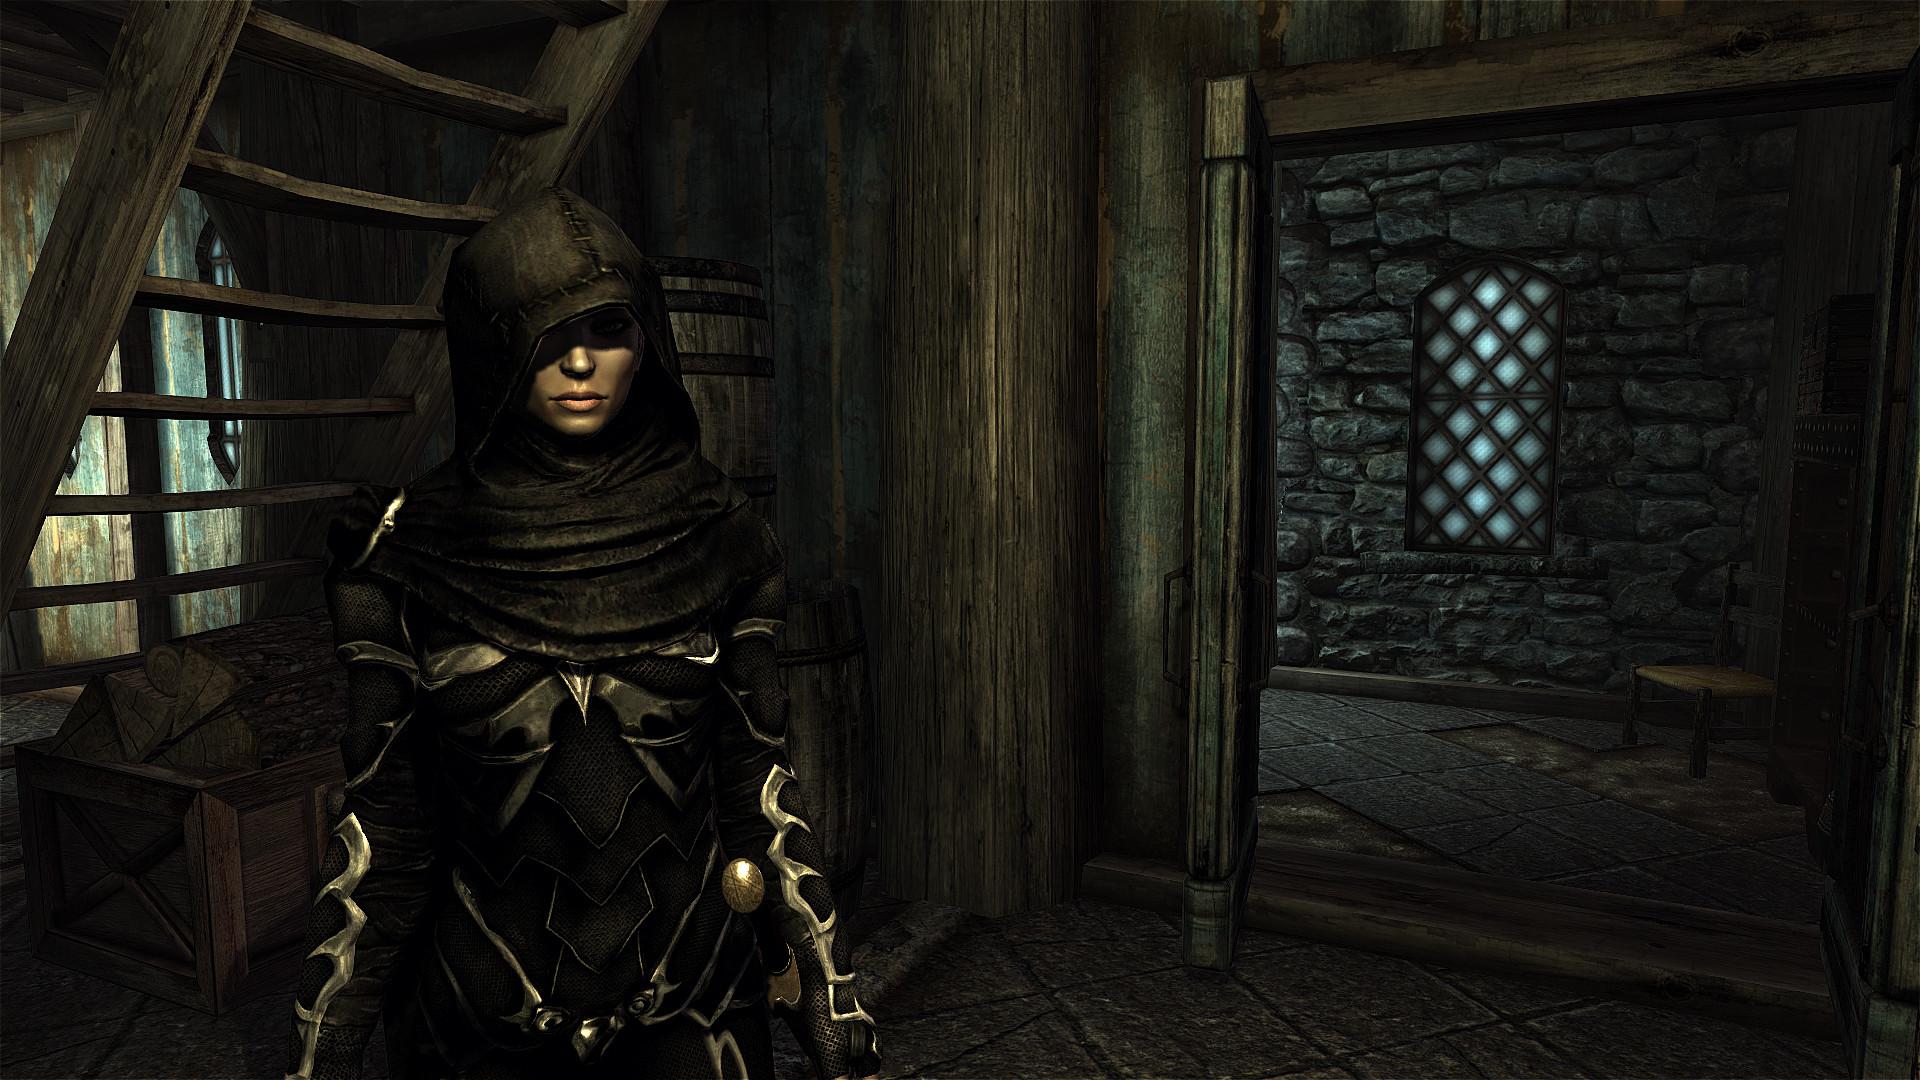 The Elder Scrolls Skyrim Review Screenshot 2 Female Assassin